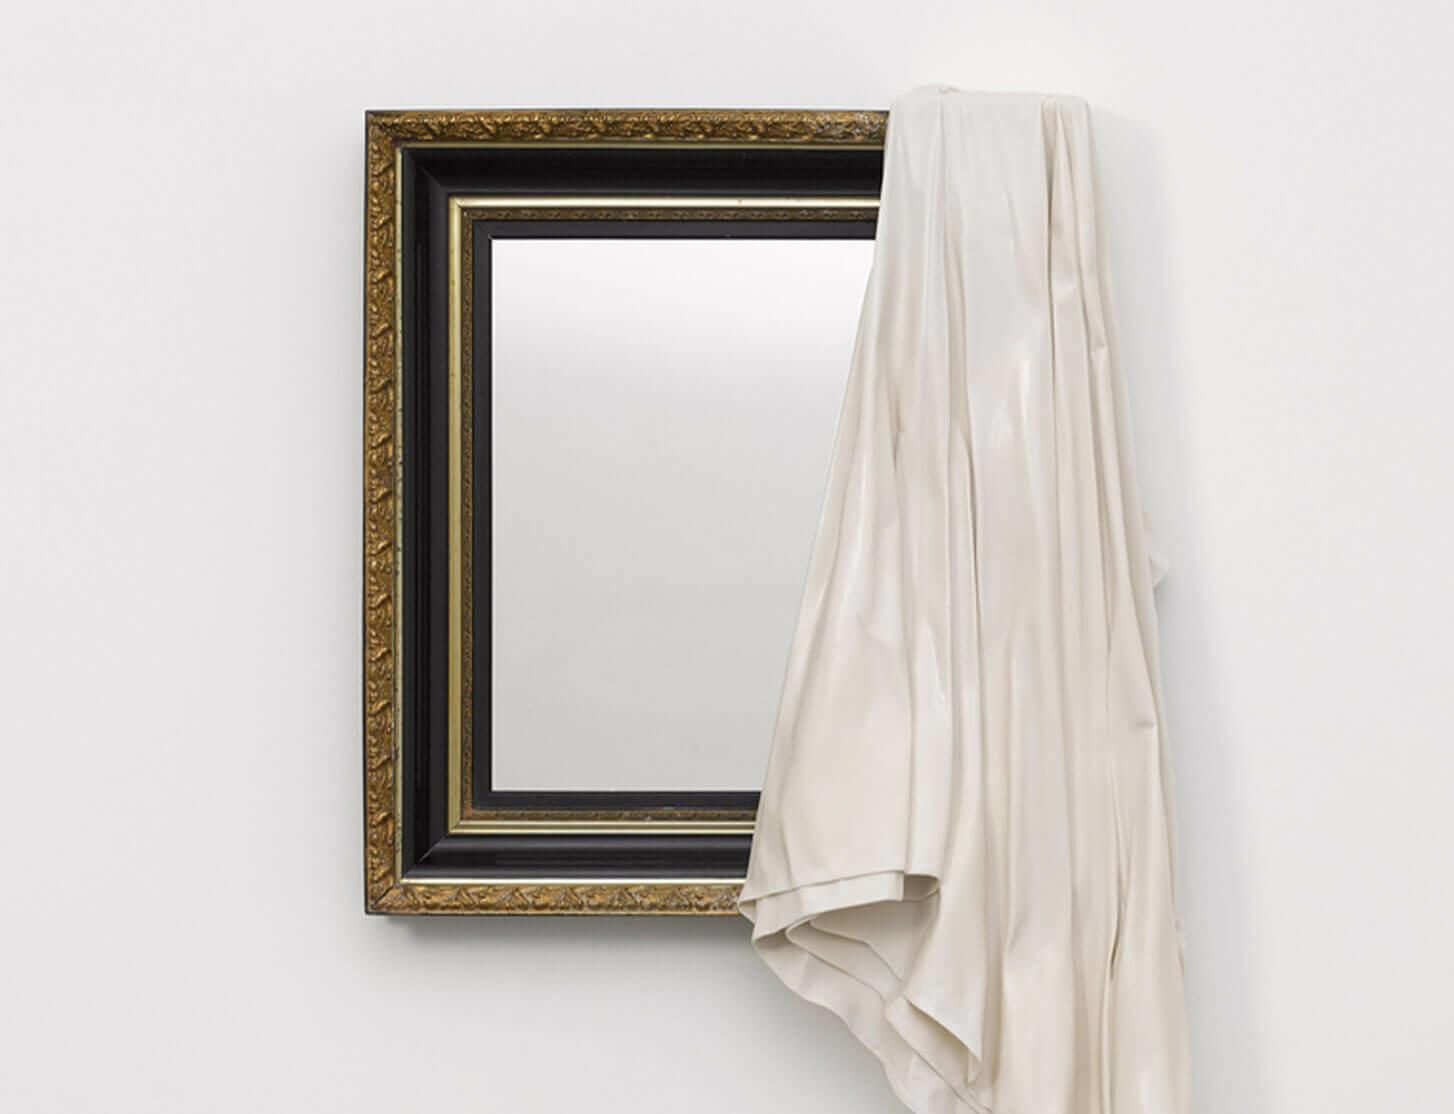 Art Basel Online Viewing Rooms: Virtual walk-through